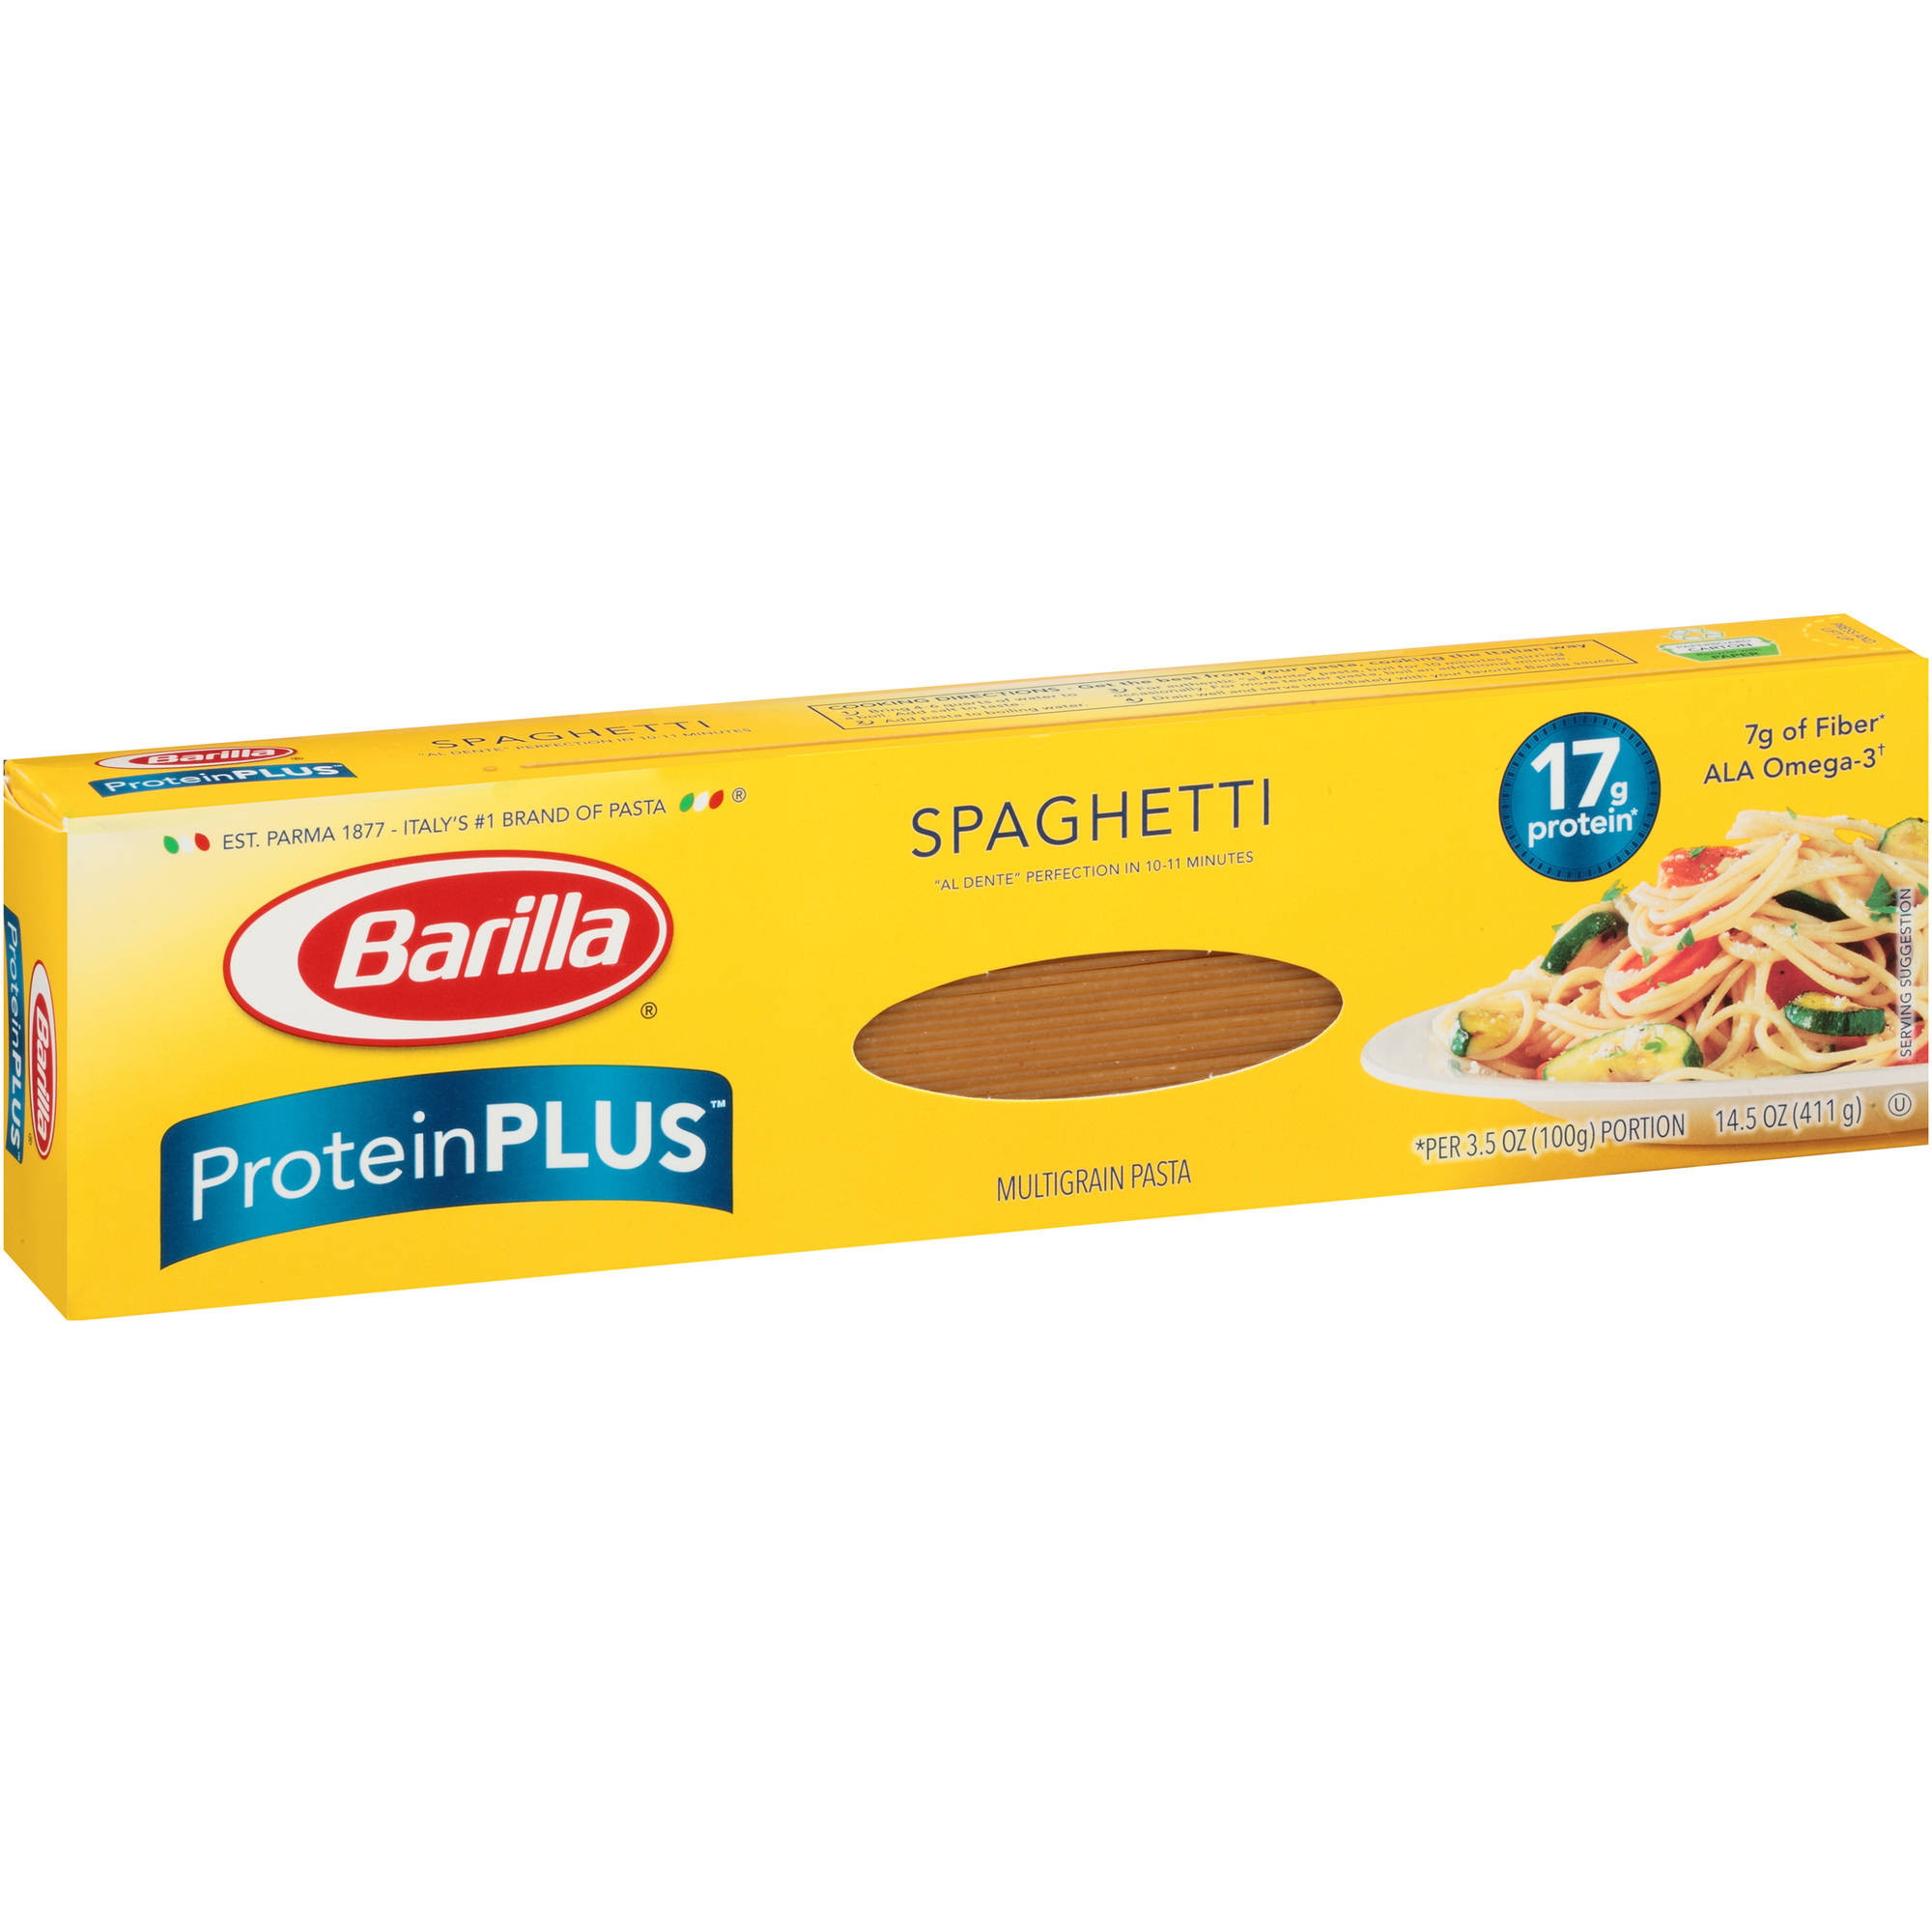 Low Carb Noodles Walmart  Barilla Protein Plus Thin Spaghetti Multigrain Pasta 14 5